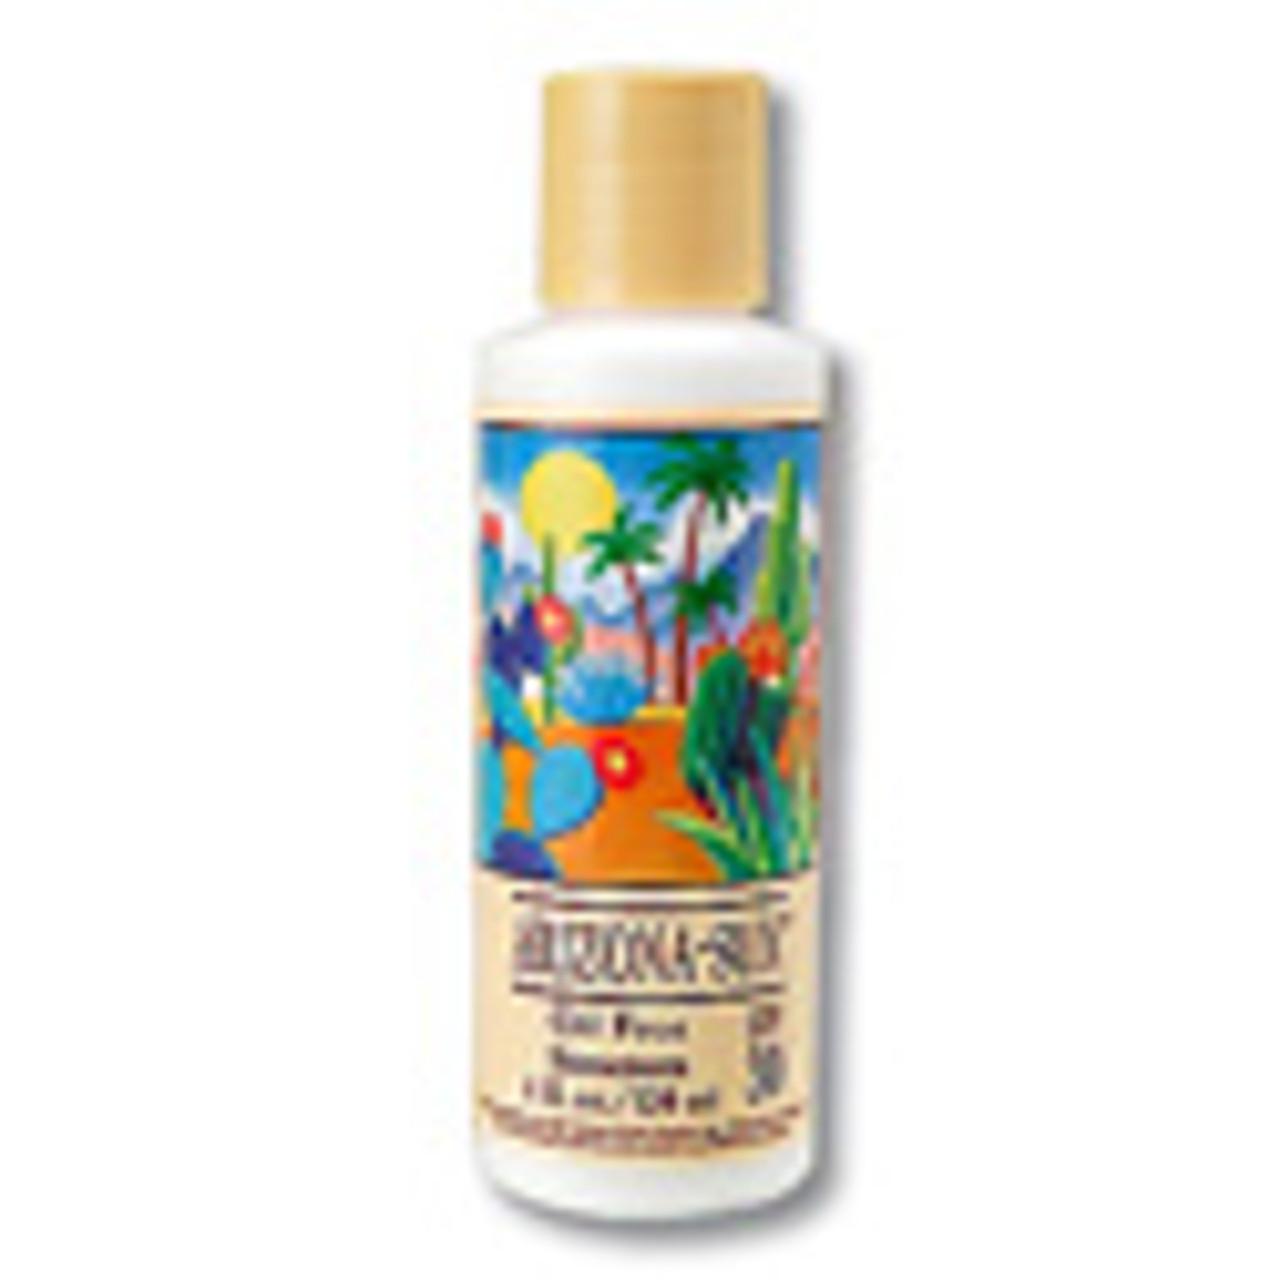 Adult Sunscreen, Oil Free, SPF30 - 4oz